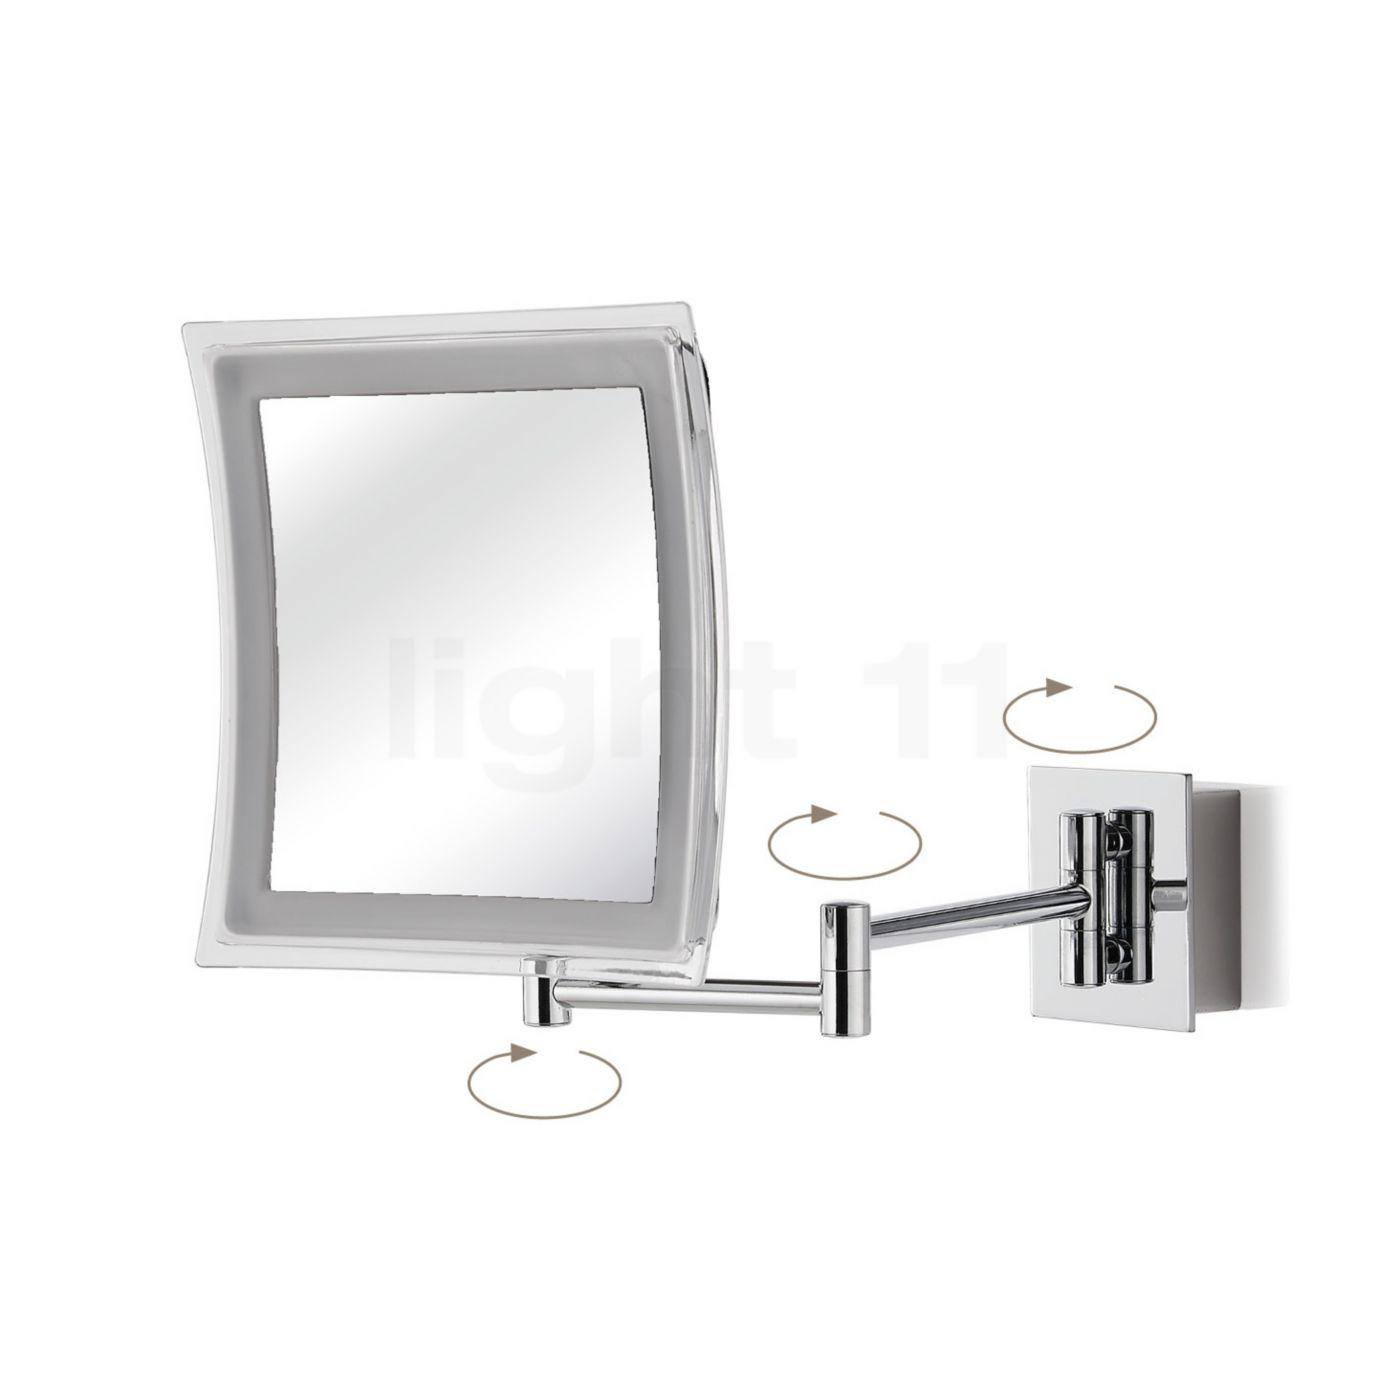 decor walther bs 84 miroir de maquillage mural. Black Bedroom Furniture Sets. Home Design Ideas